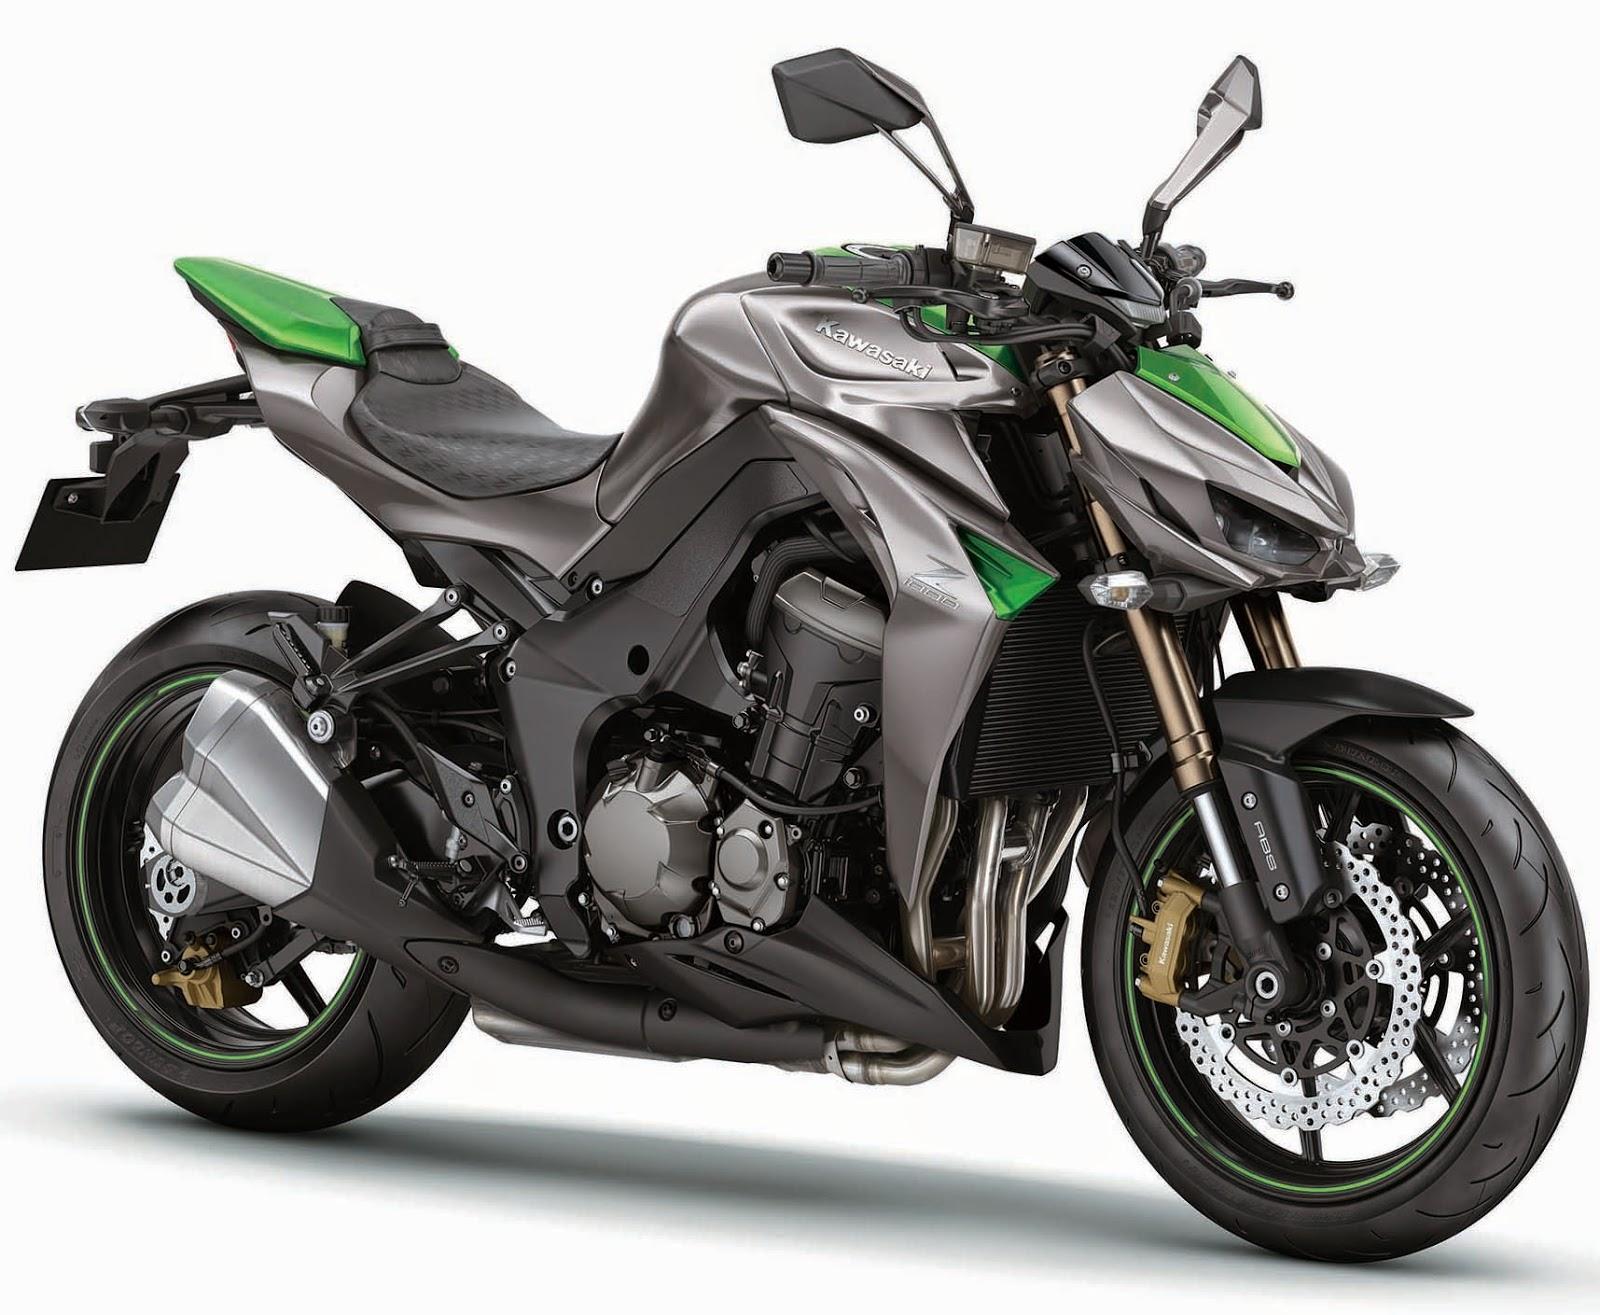 Harga Dan Spesifikasi Kawasaki Z1000, Otomotif